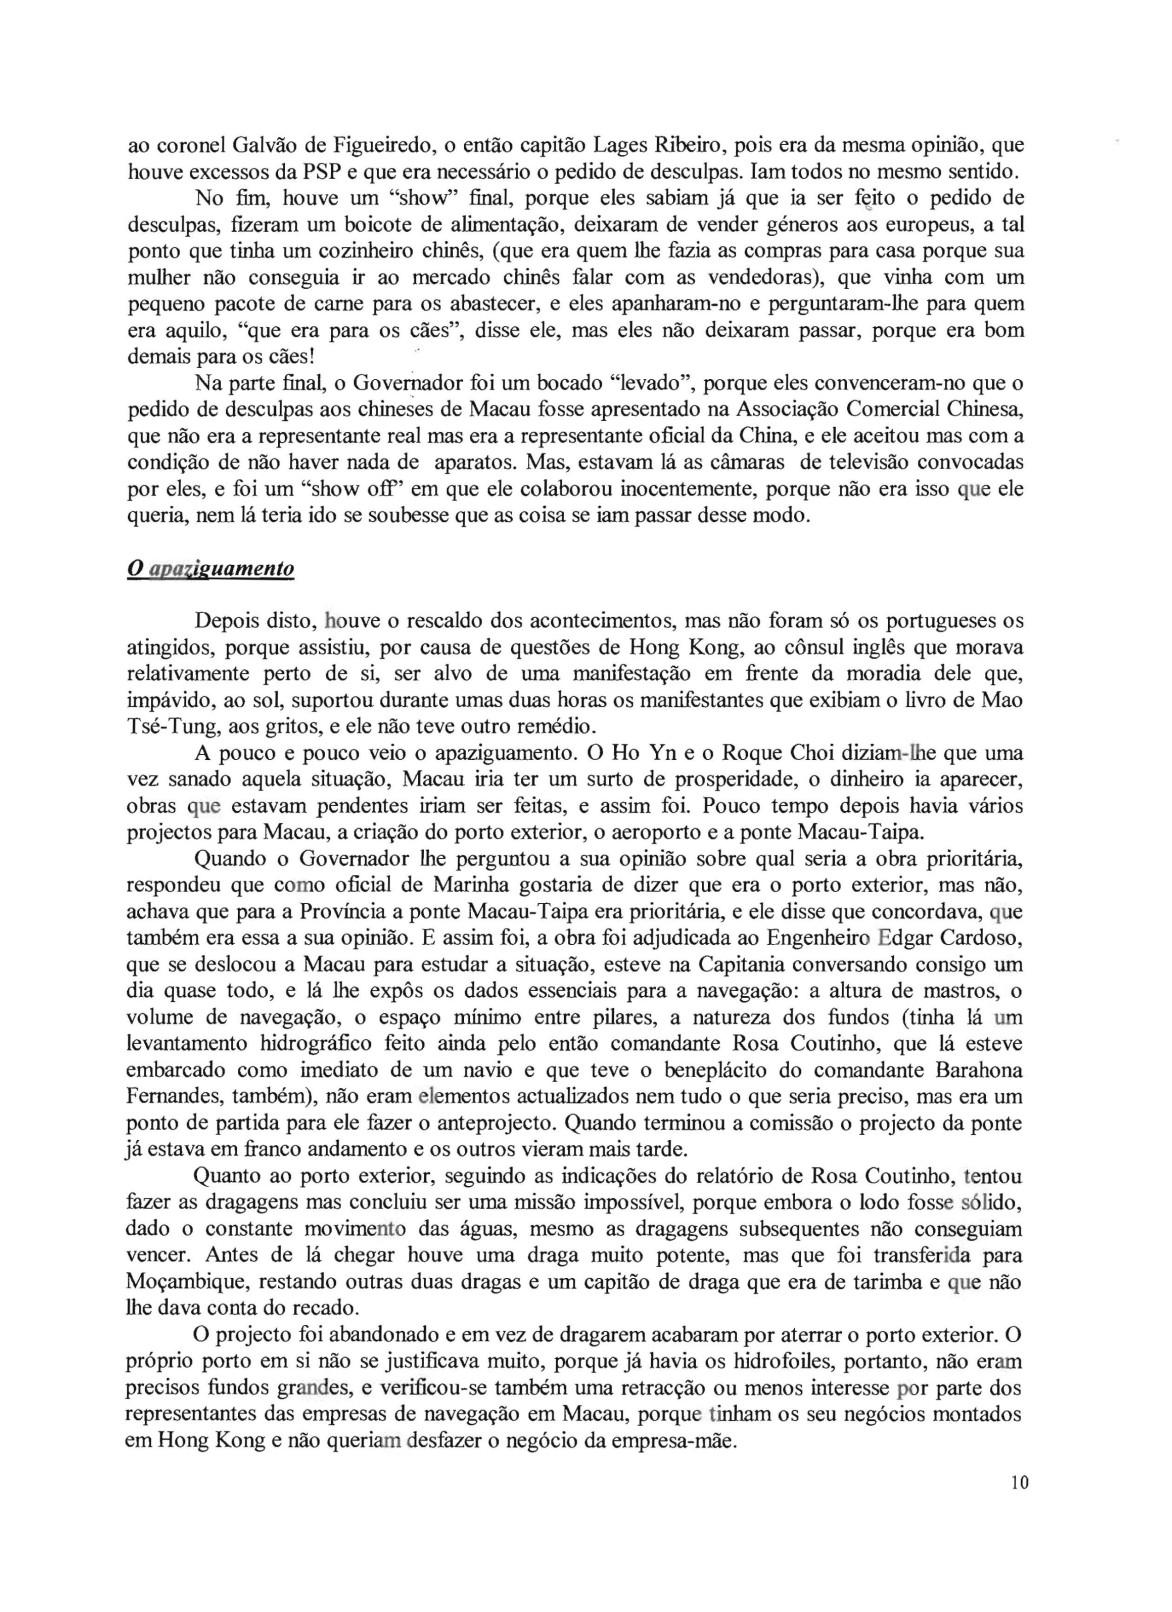 00475 01-03-28 Academia de Marinha-Entrevista do Alm Nunes da Silva pg 10 de 12